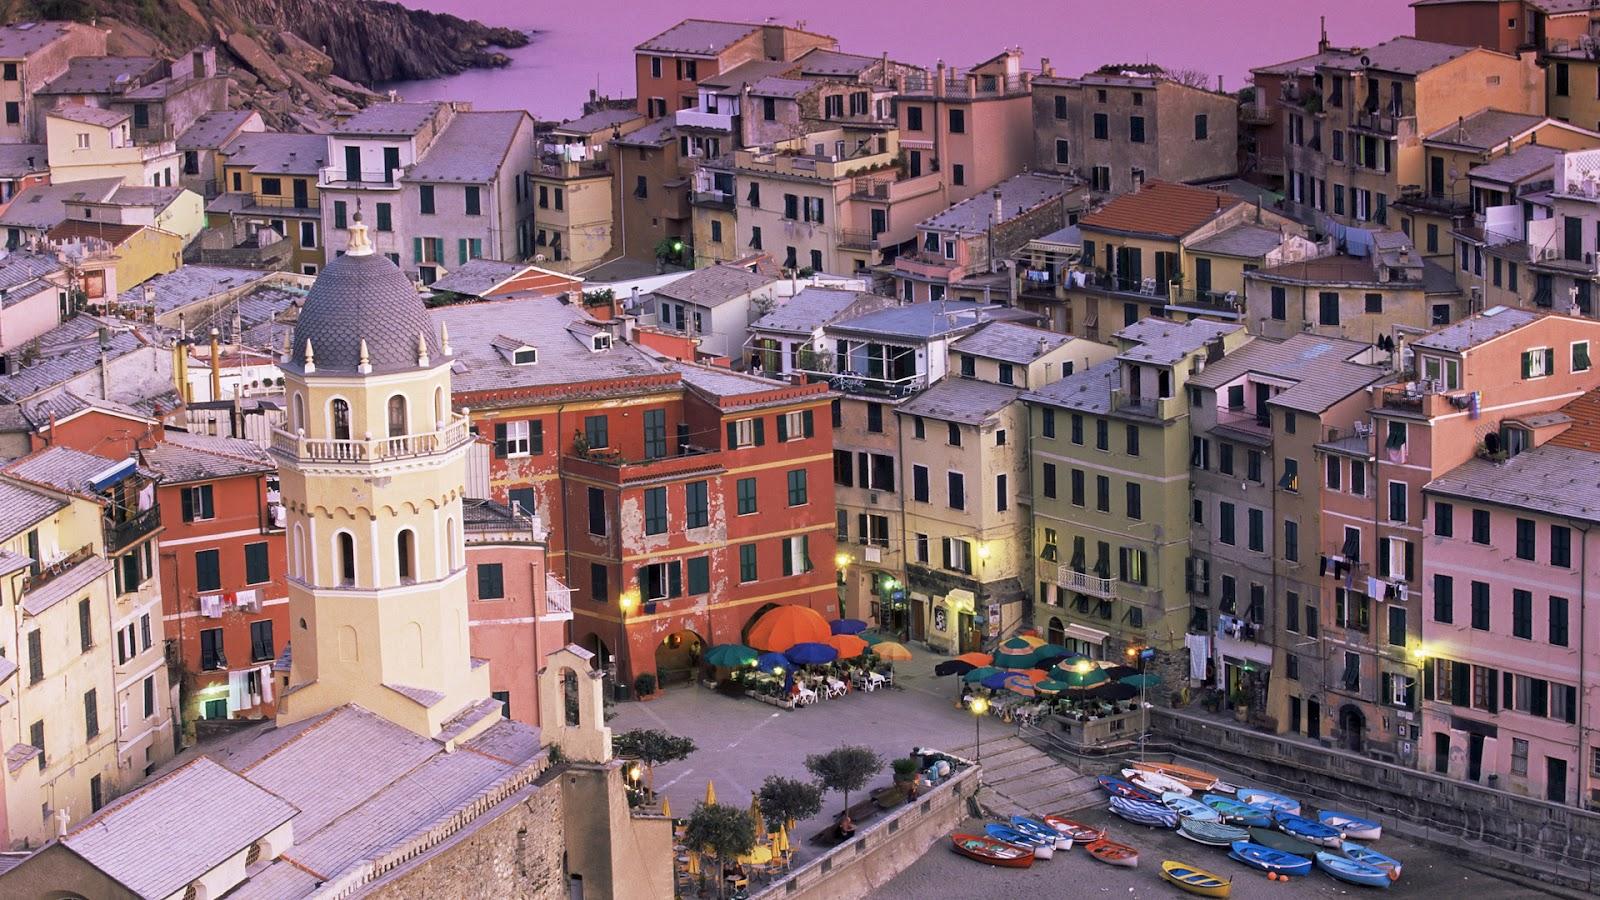 http://1.bp.blogspot.com/-j7IDGOZyj-E/UA1PuW1e5tI/AAAAAAAAAPE/WNaQu6g5y34/s1600/Vernazza+Village+and+Harbor+at+Dusk,+Cinque+Terre,+Italy.jpg